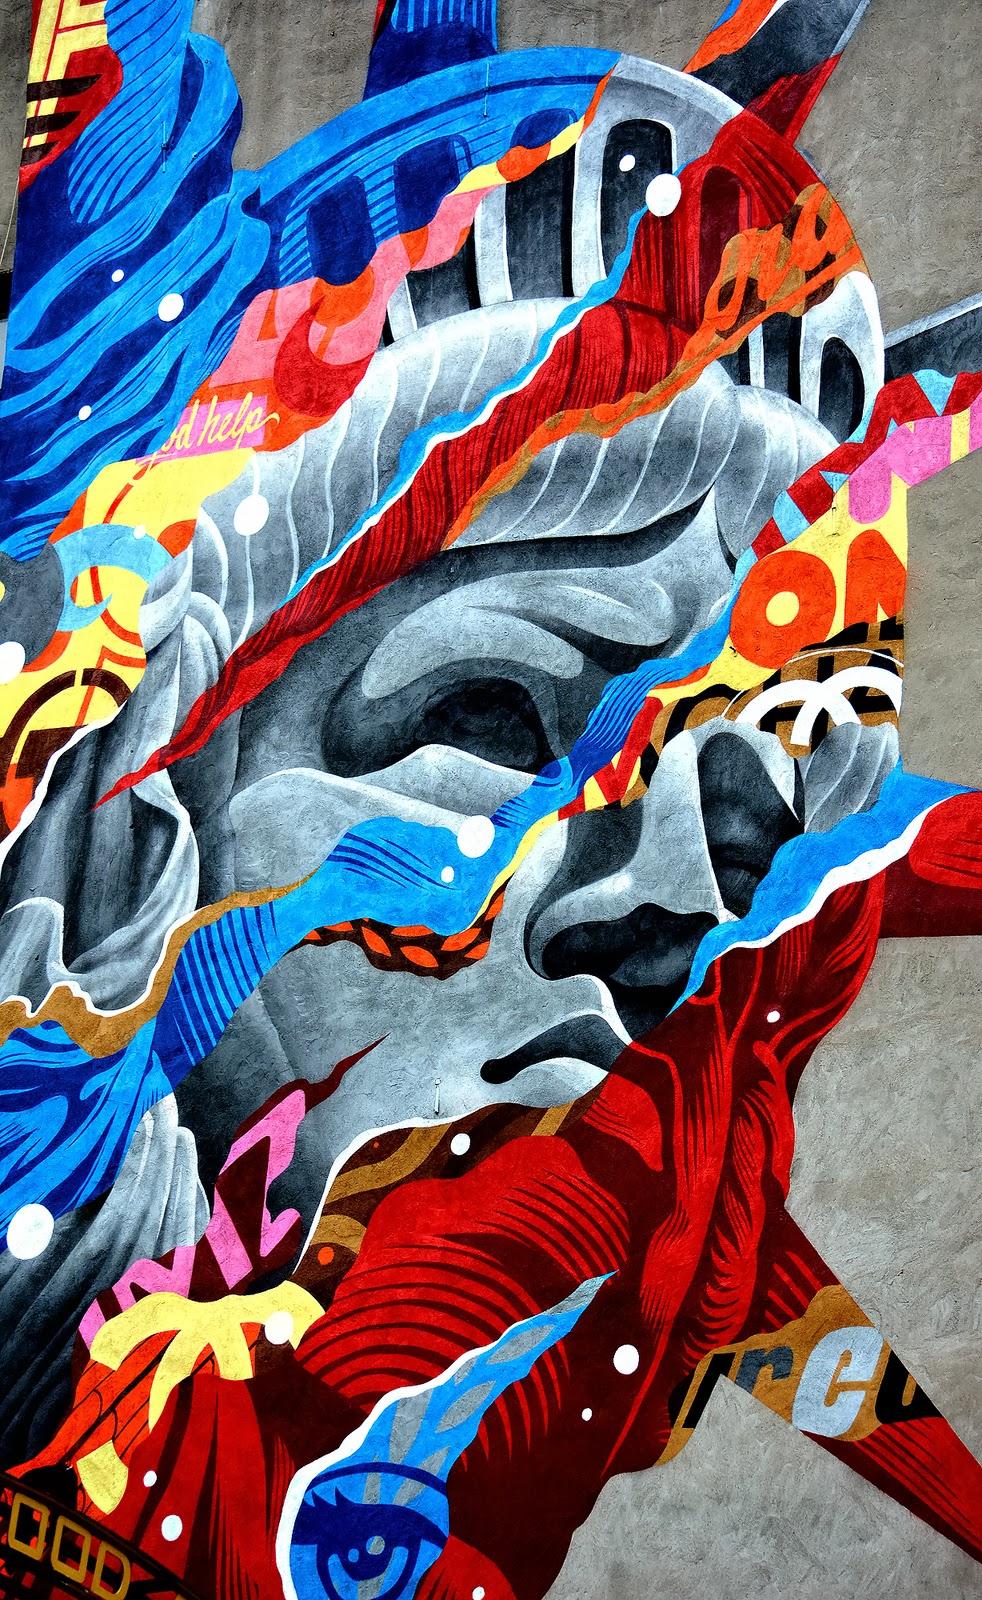 Street Art : Murals by Tristan Eaton in USA : street-art ... |Nyc Street Art